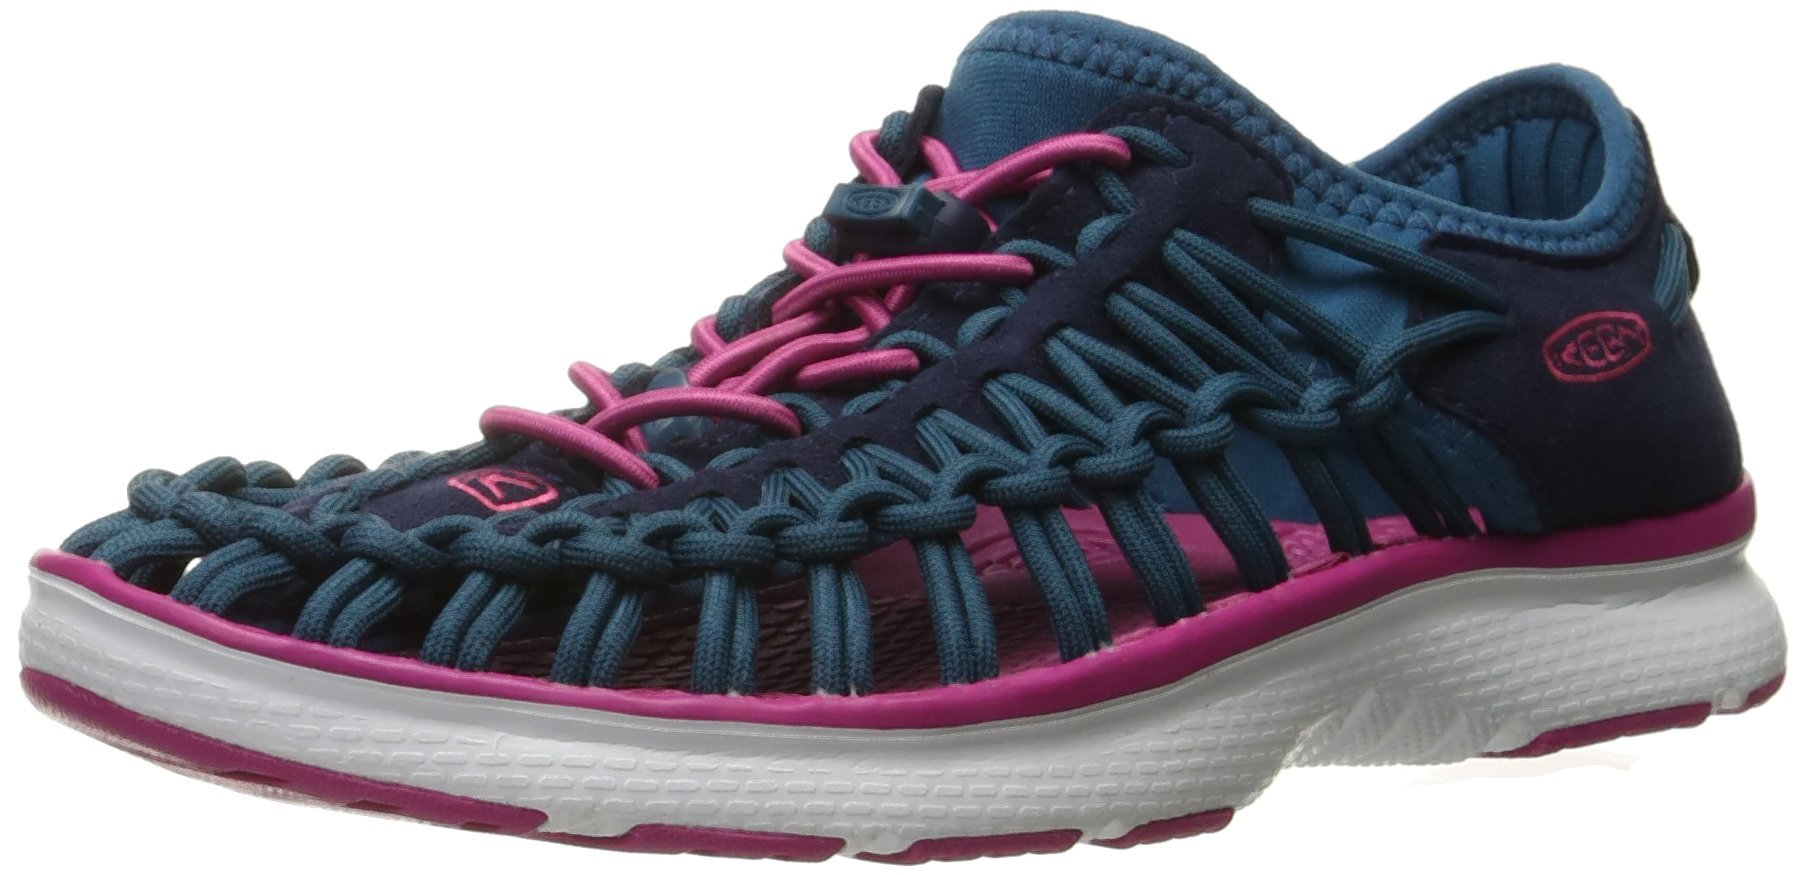 KEEN Unisex-Kids Uneek O2 Dress Sandal, Blue/Very Berry, 3 M US Big Kid